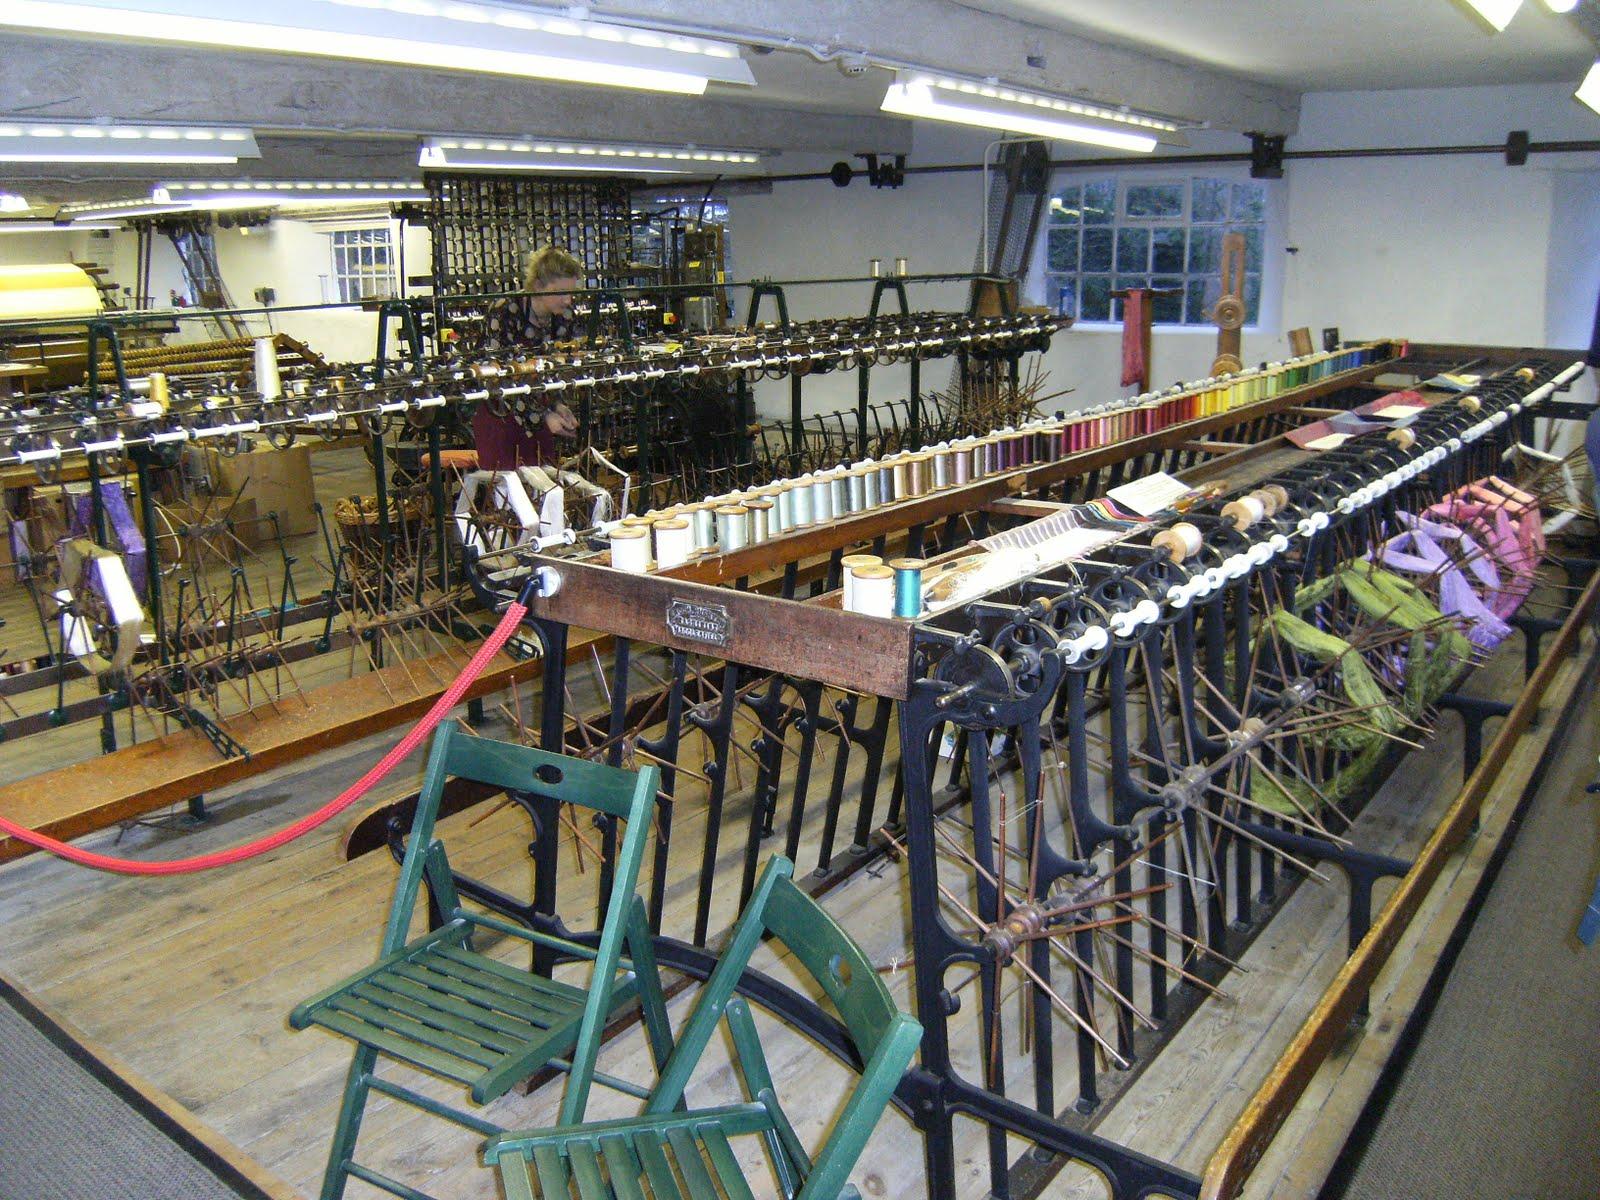 DSCF2727 Whitchurch Silk Mill